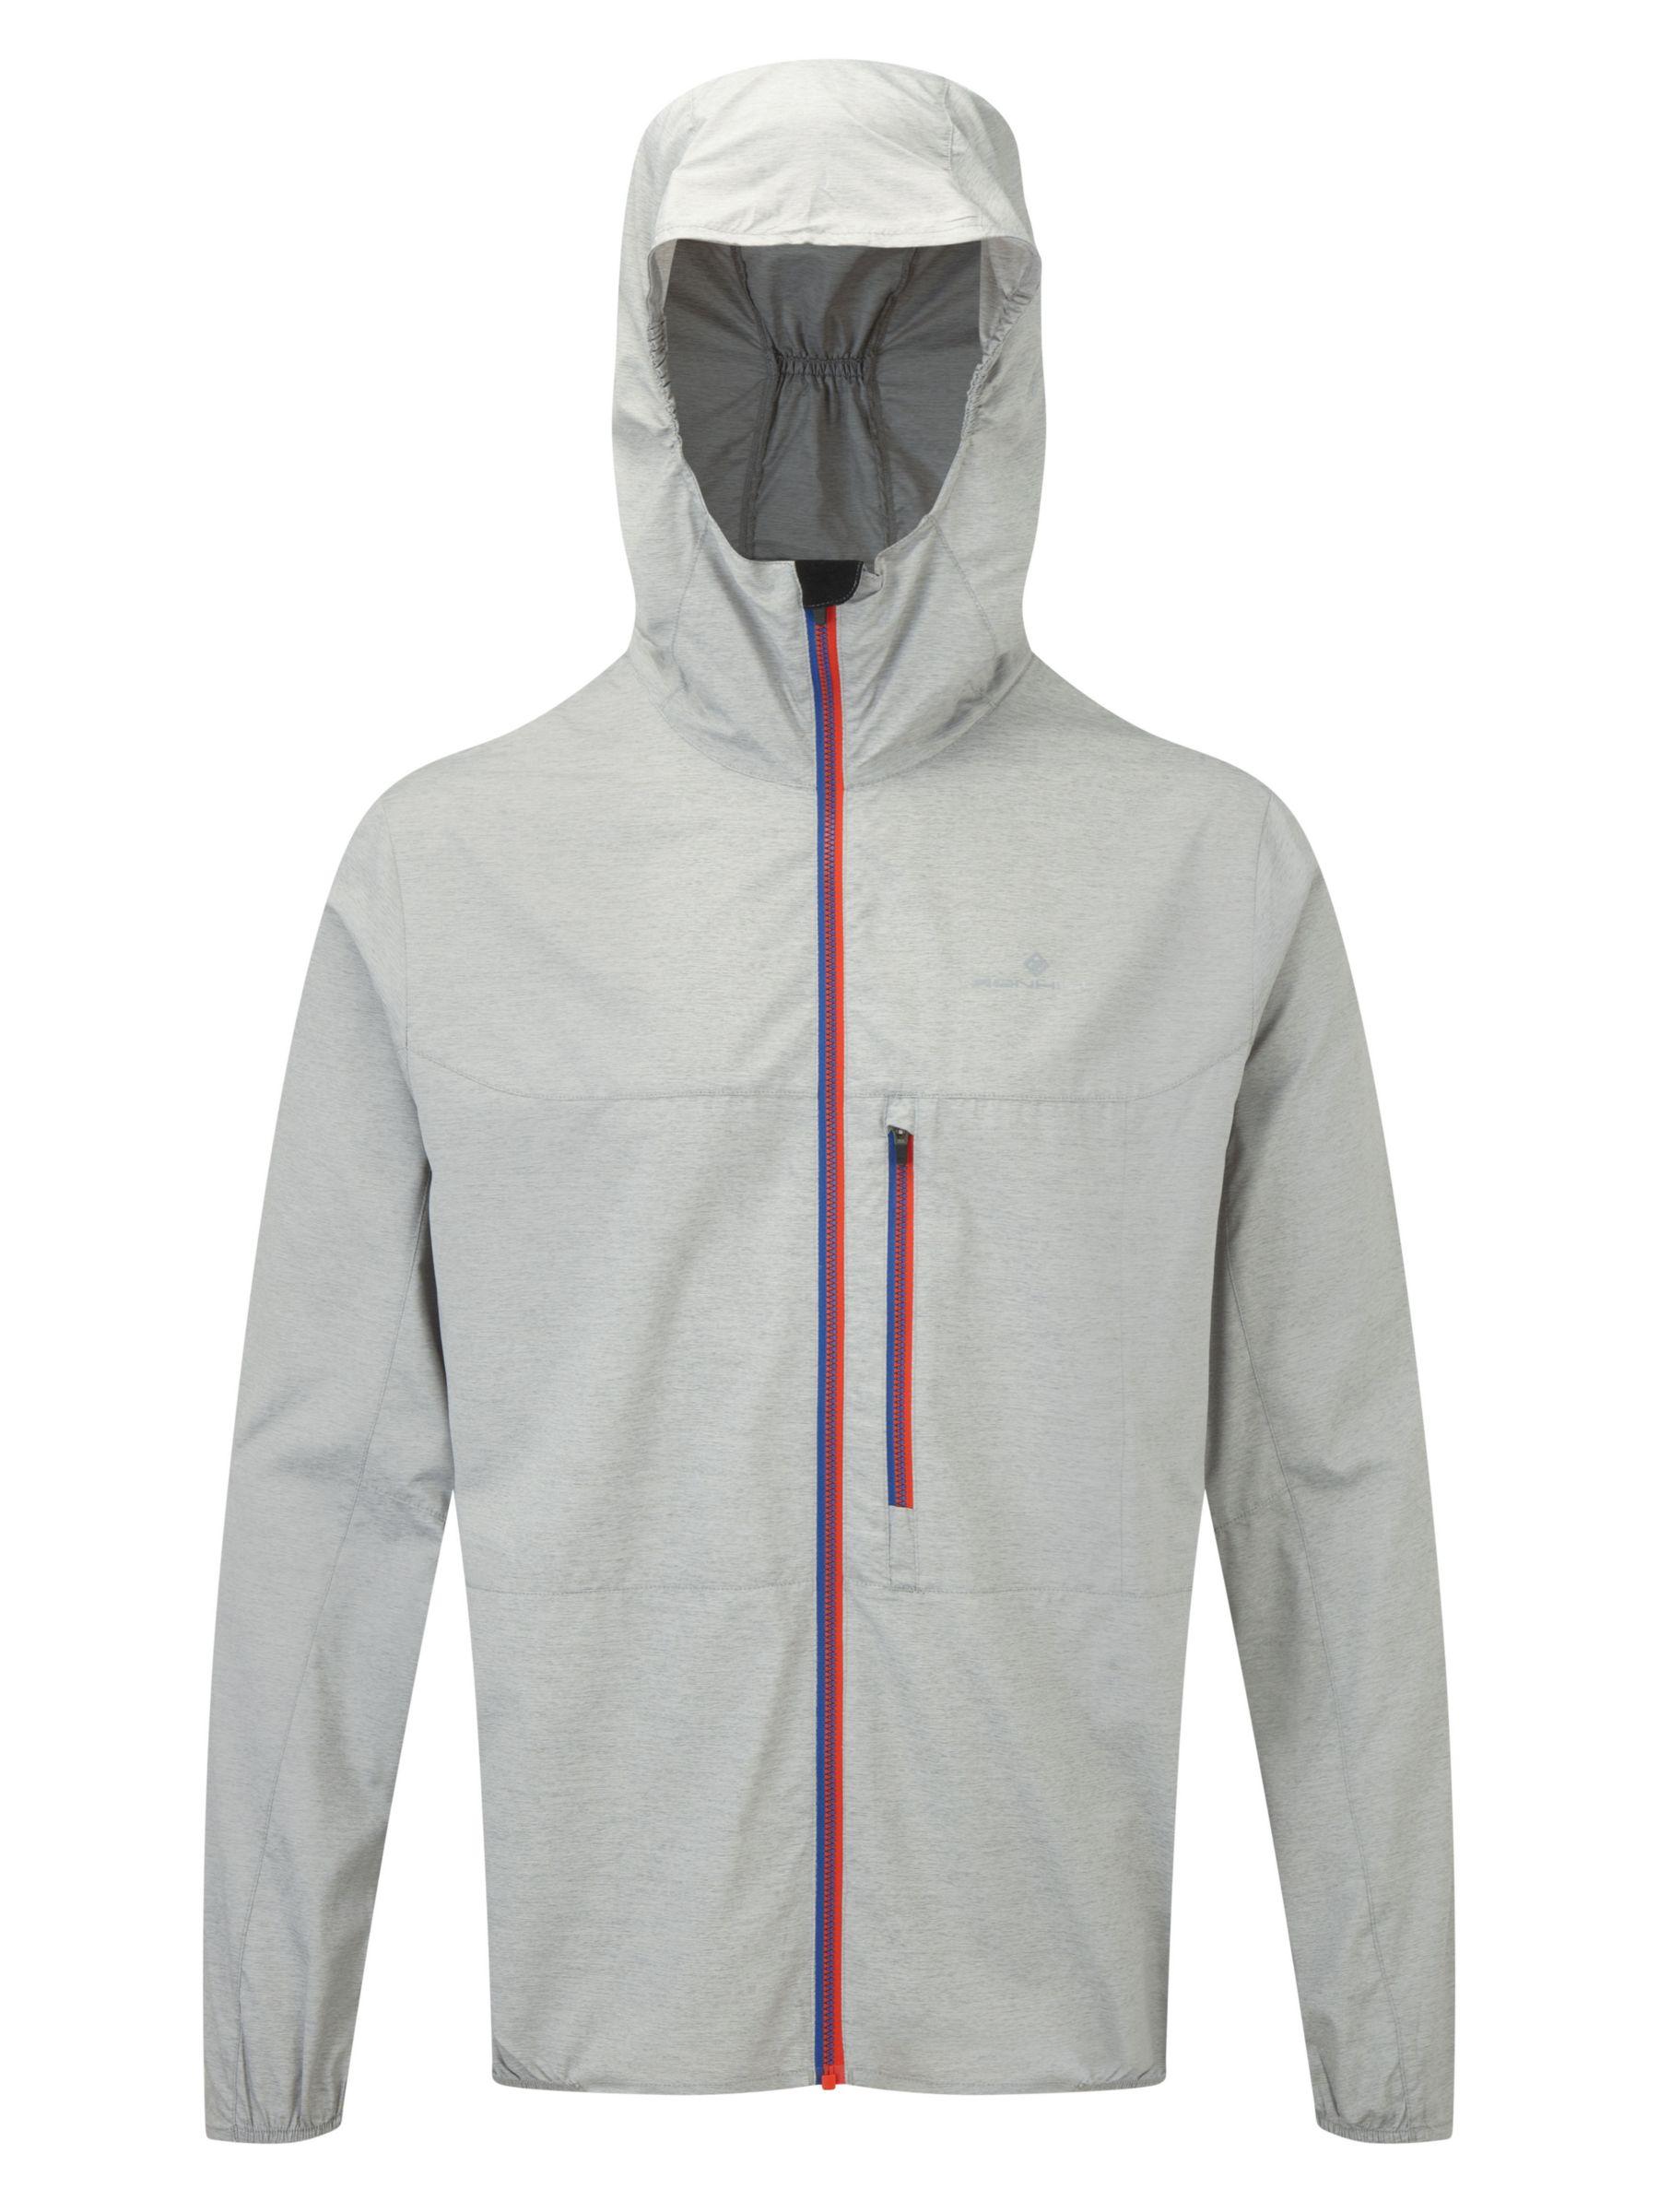 Ronhill Ronhill Momentum Windforce Men's Running Jacket, Grey